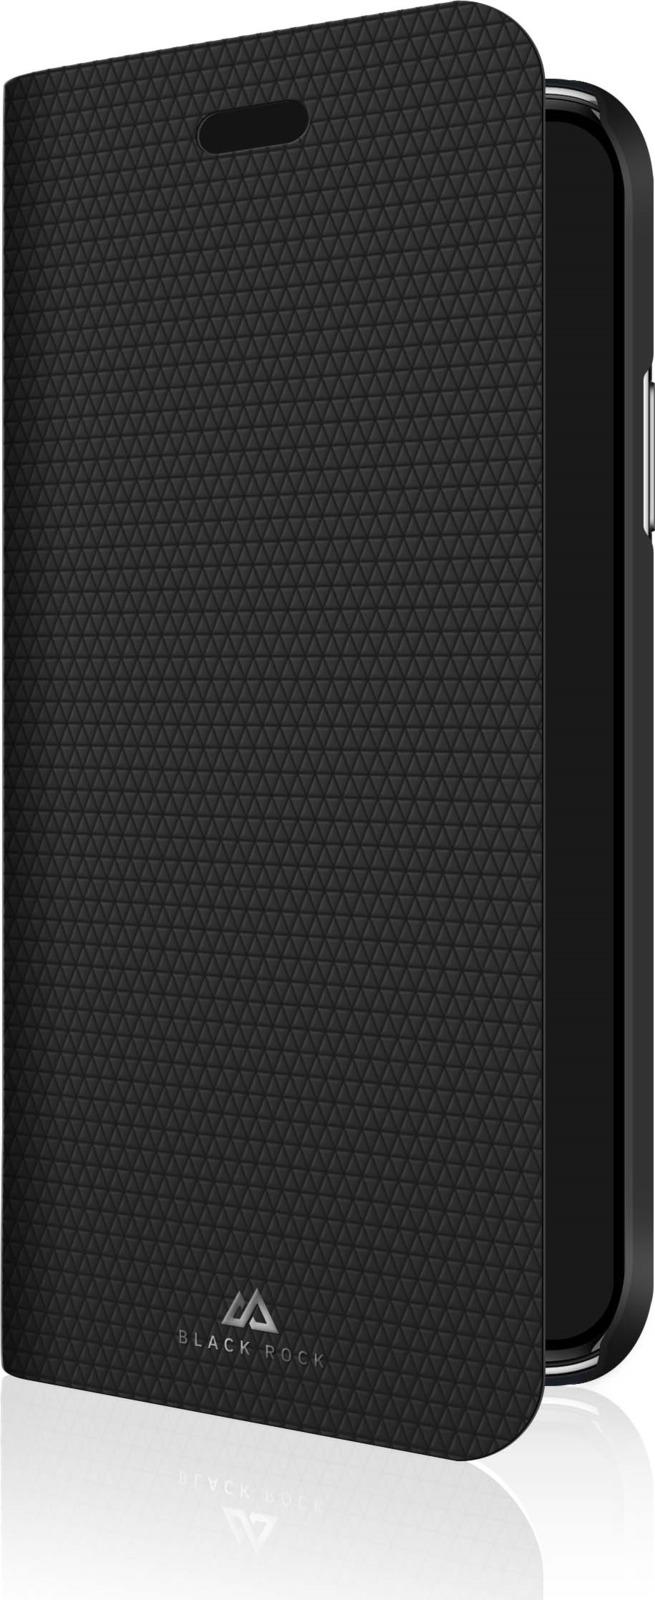 лучшая цена Чехол для Apple iPhone XS, Apple iPhone X The Standard Booklet, для iPhone XS/X